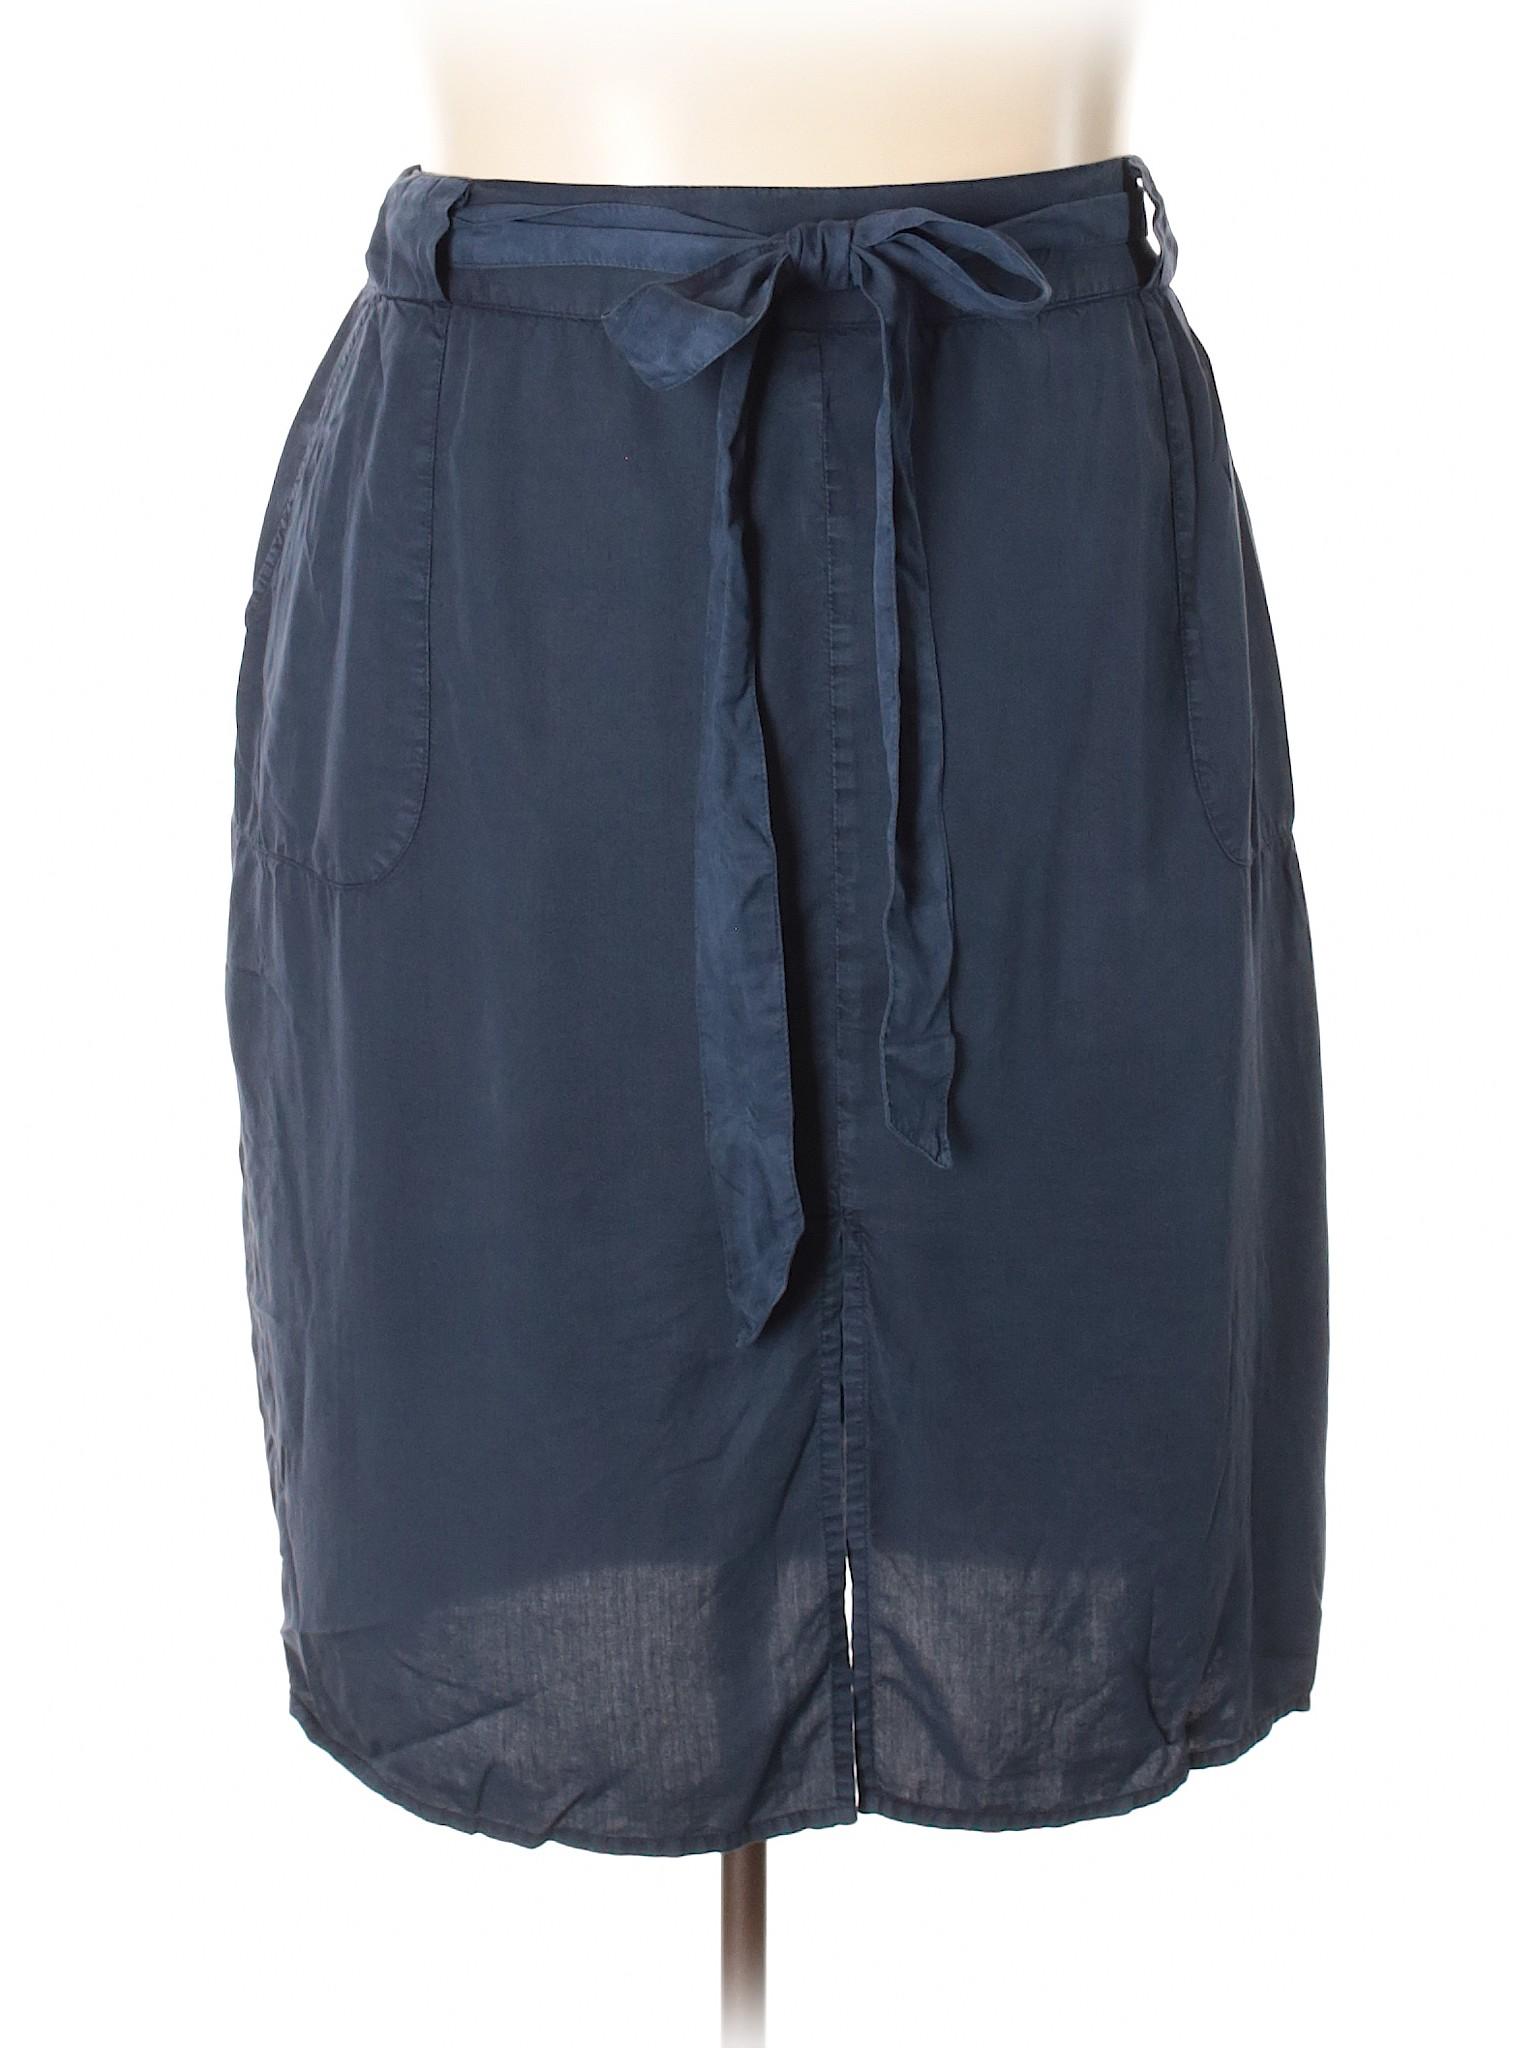 Skirt Casual Casual Casual Casual Skirt Boutique Boutique Boutique Boutique Skirt EgxU8nPq